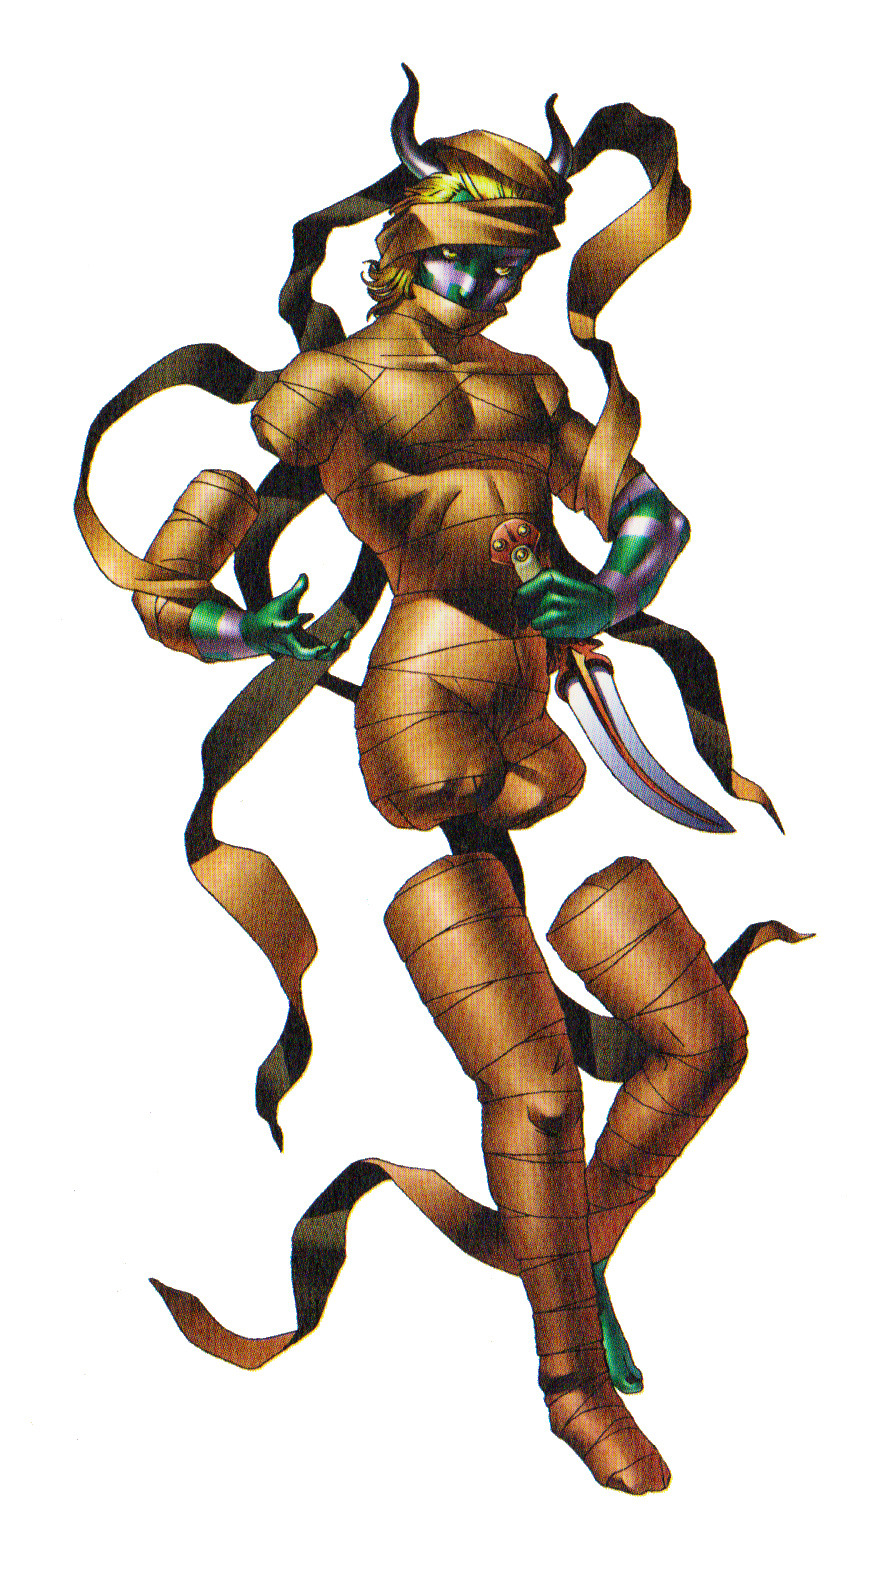 Attis Megami Tensei Wiki A Demonic Compendium Of Your